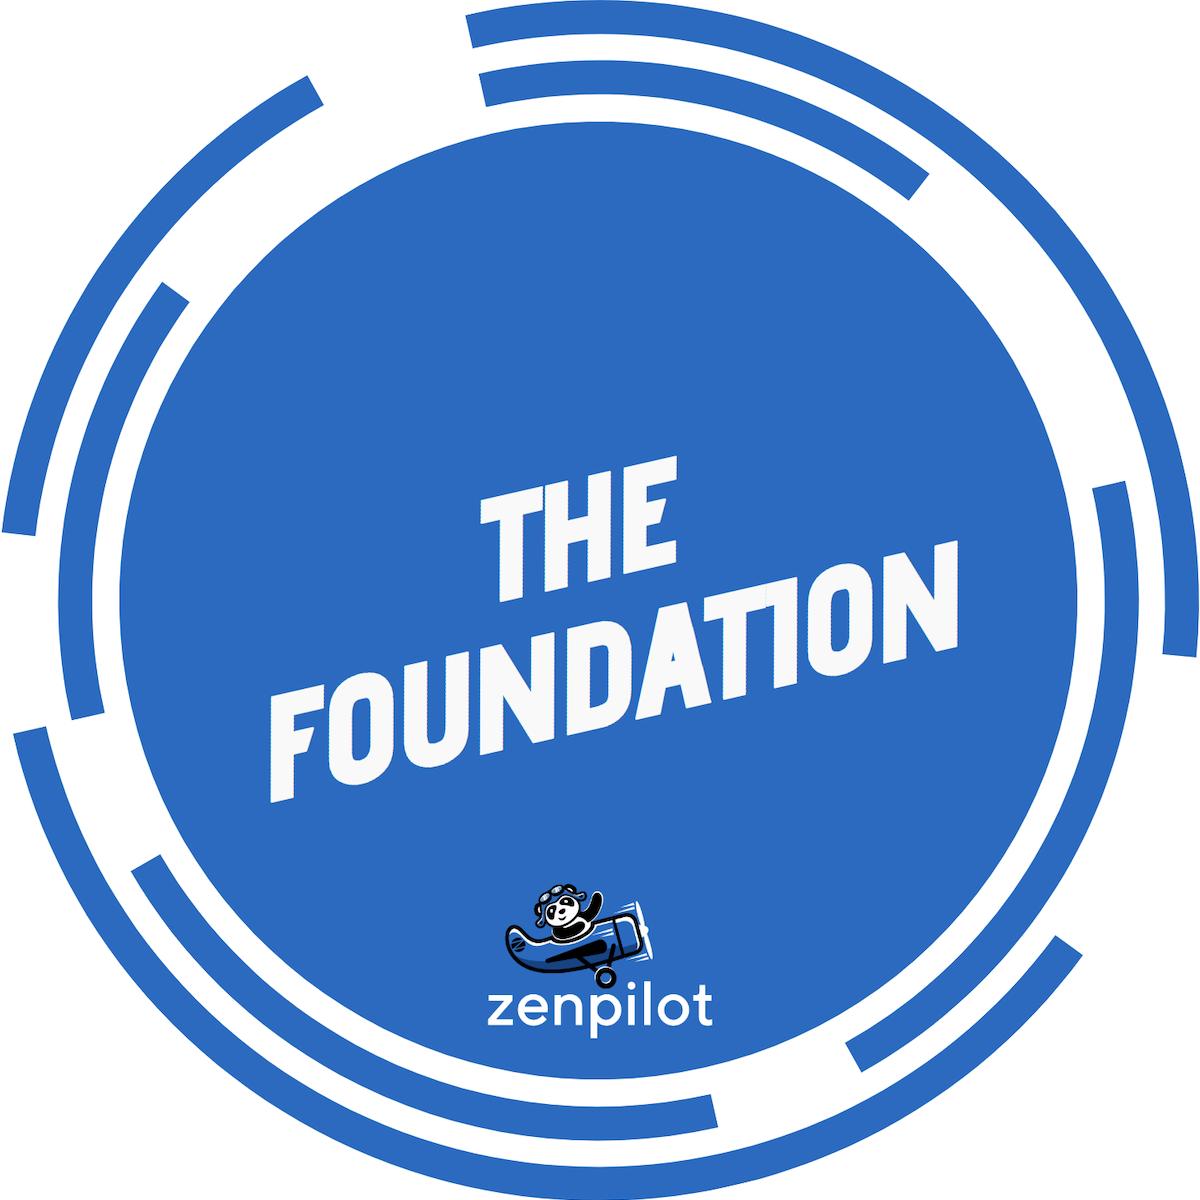 The Foundation - ZenPilot